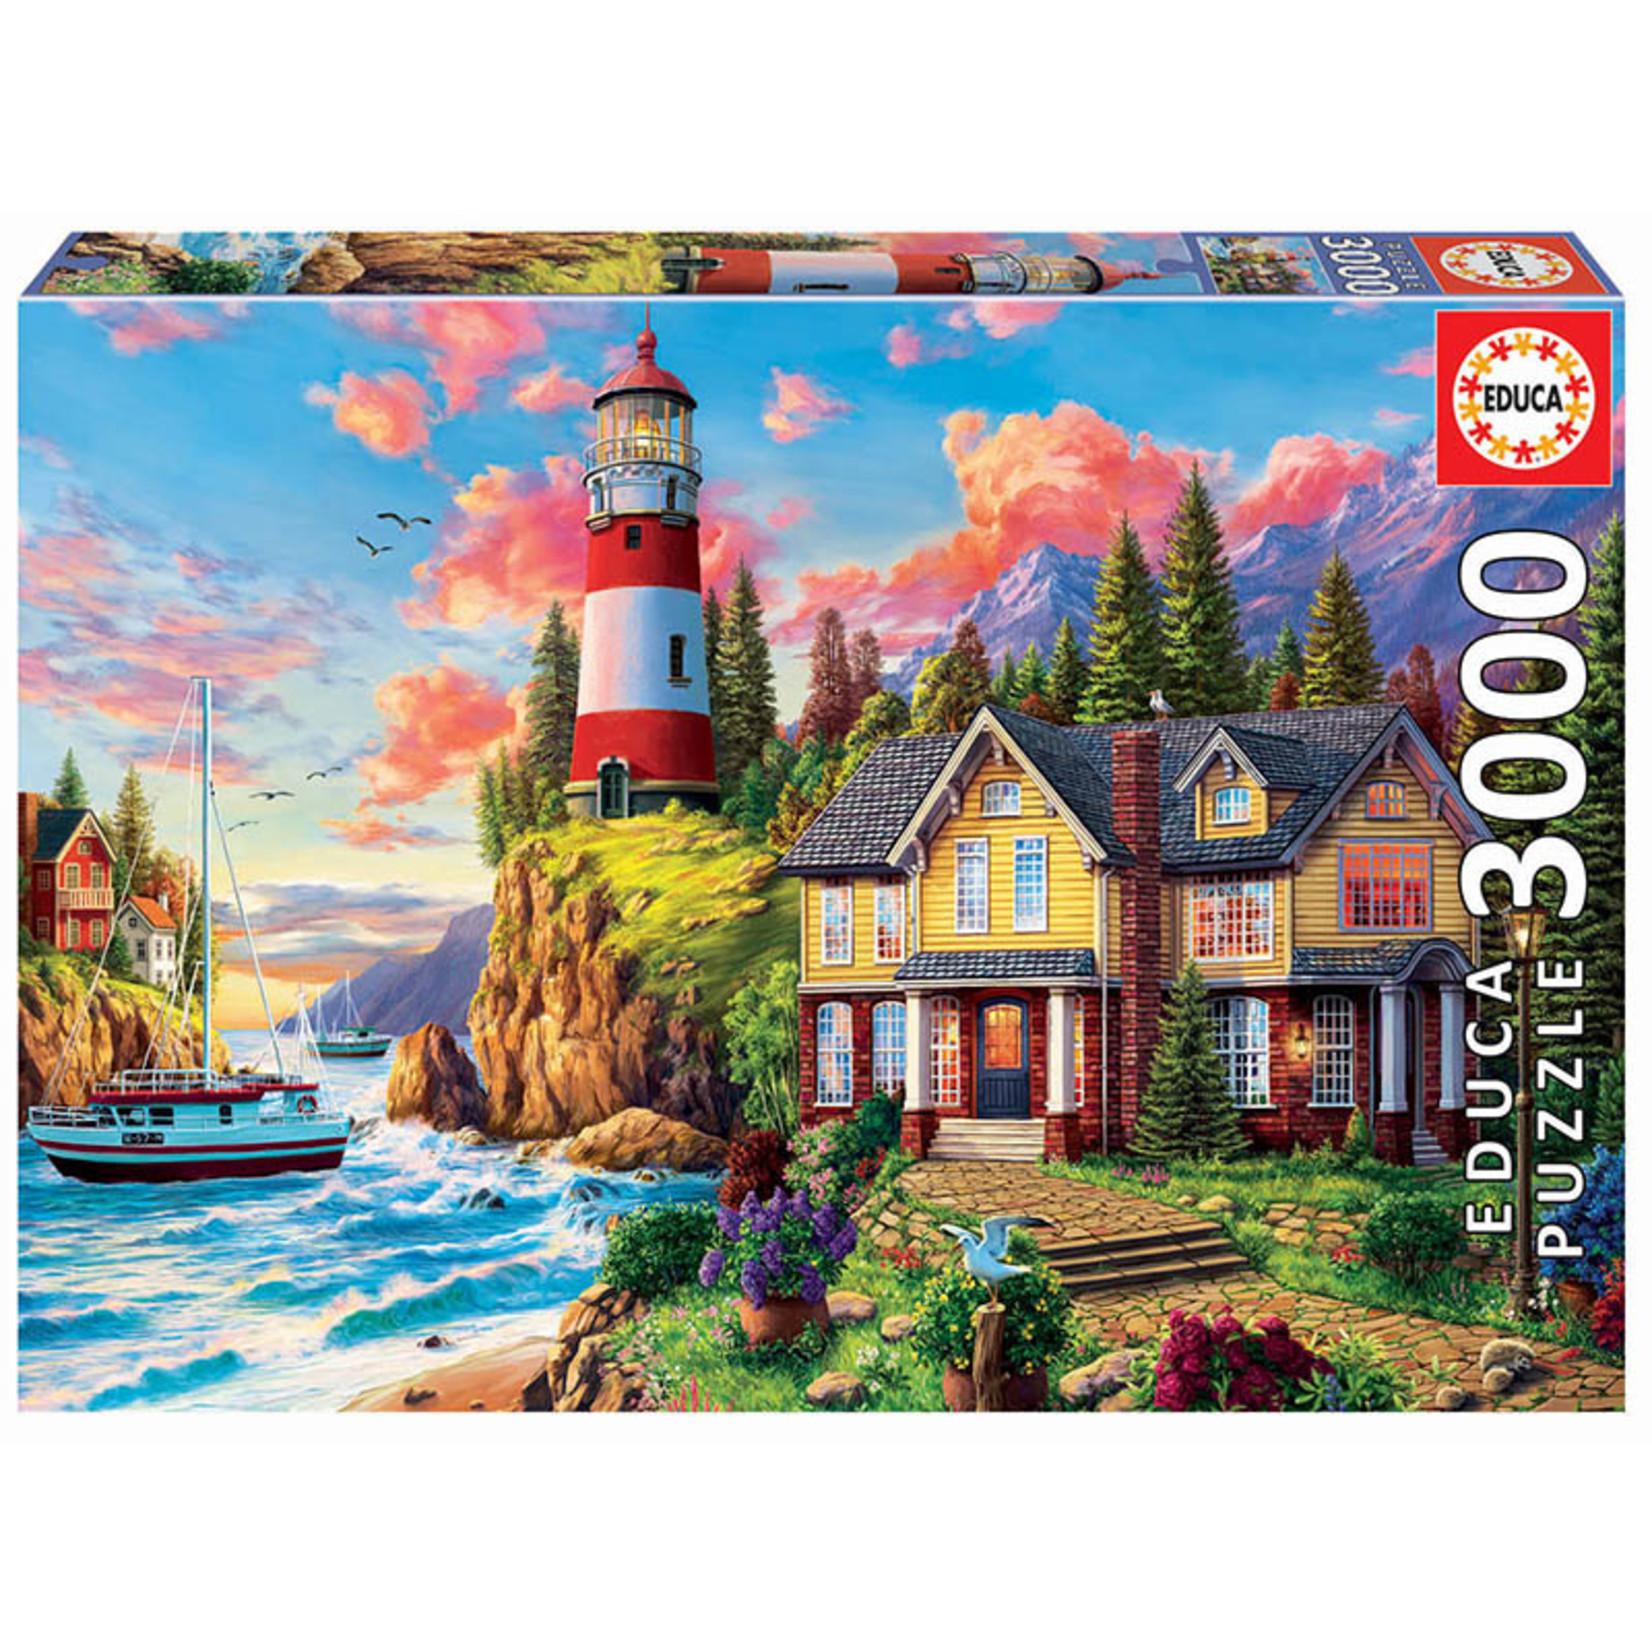 Educa Puzzles Lighthouse Near the Ocean 3000pc